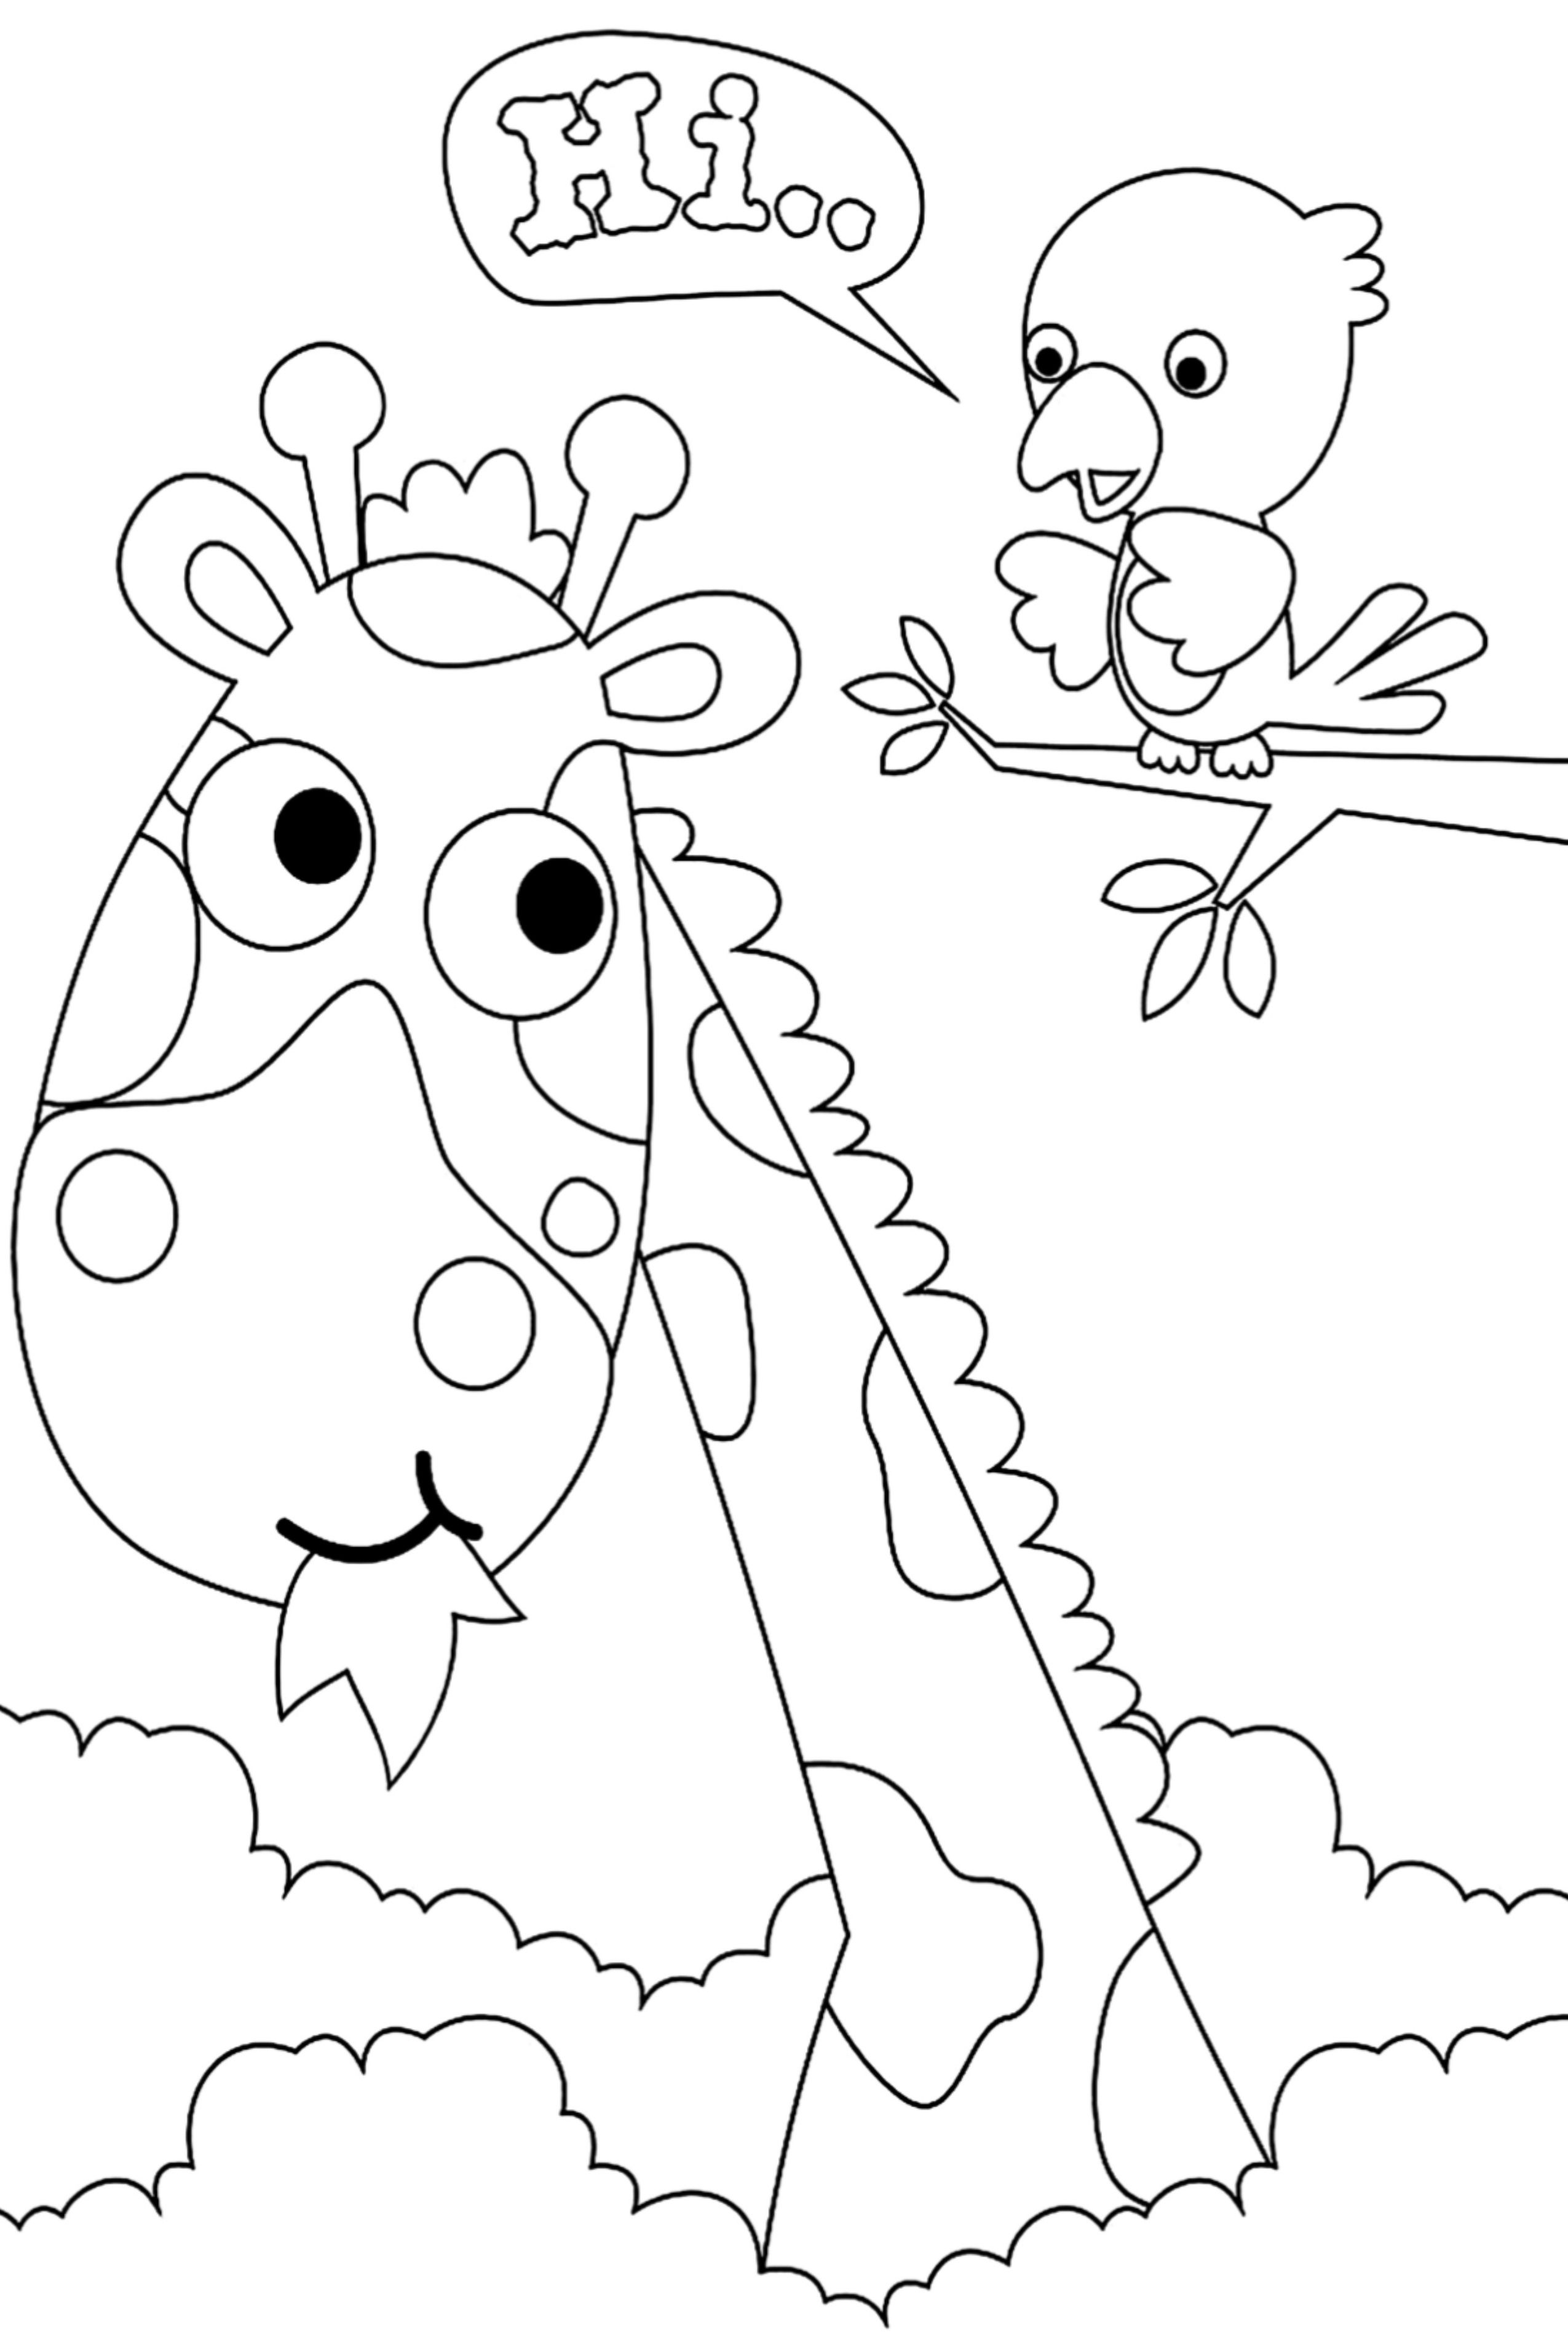 100 Animal Coloring Pages For Kids Desenhos